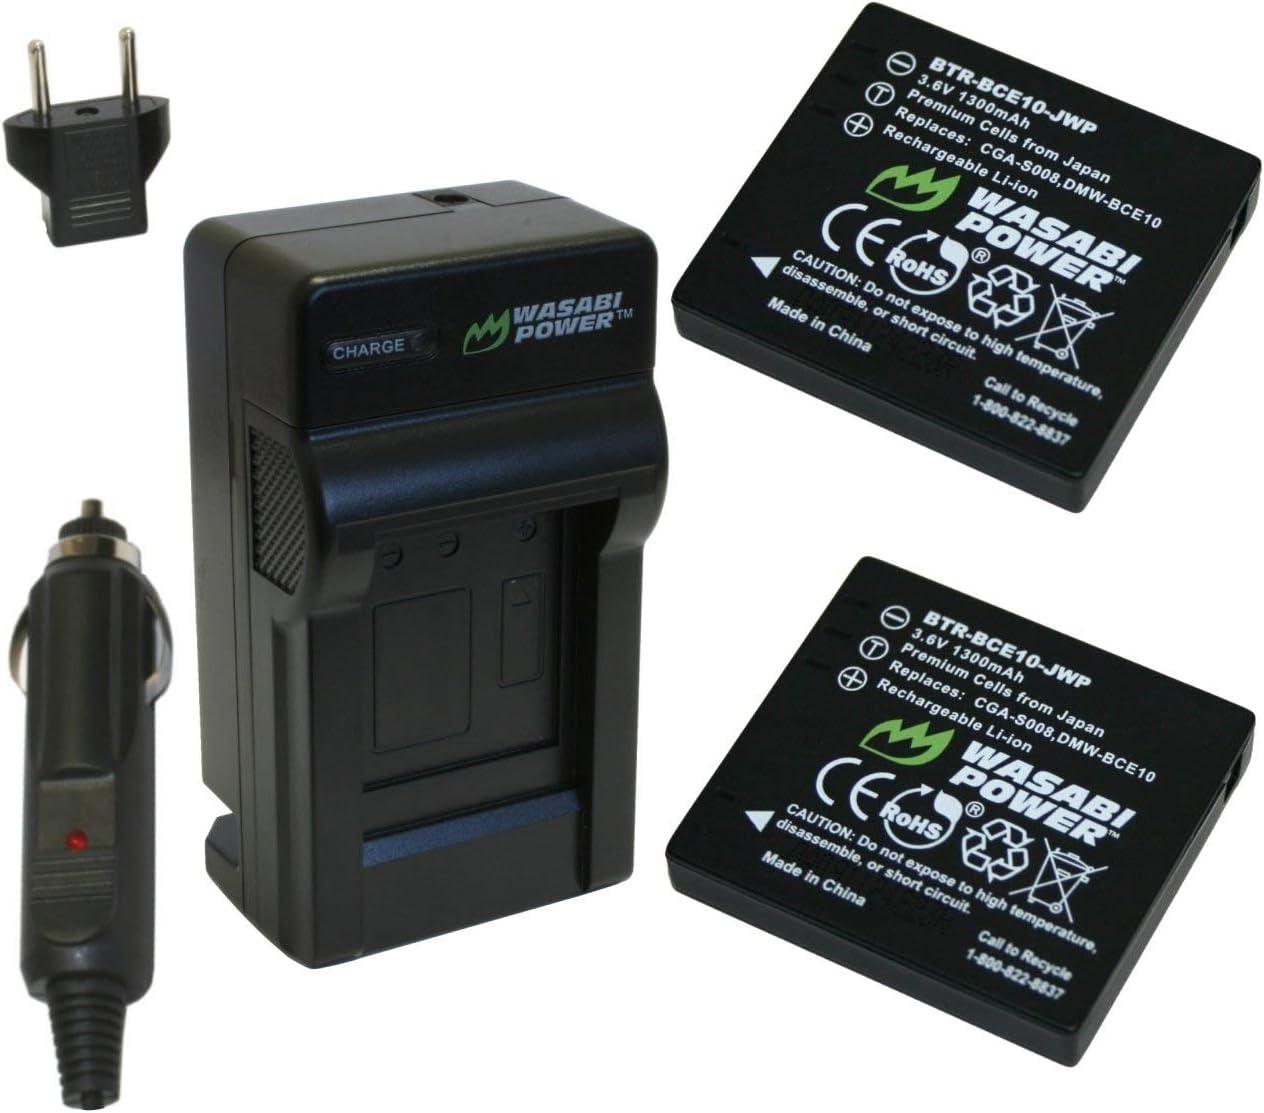 DMW-BCE10PP CGA-S008A CGA-S008E//1B LCD Micro USB Battery Charger for Panasonic Lumix CGA-S008 DMW-BCE10E CGA-S008A//1B VW-VBJ10E CGA-S008E VW-VBJ10 DMW-BCE10